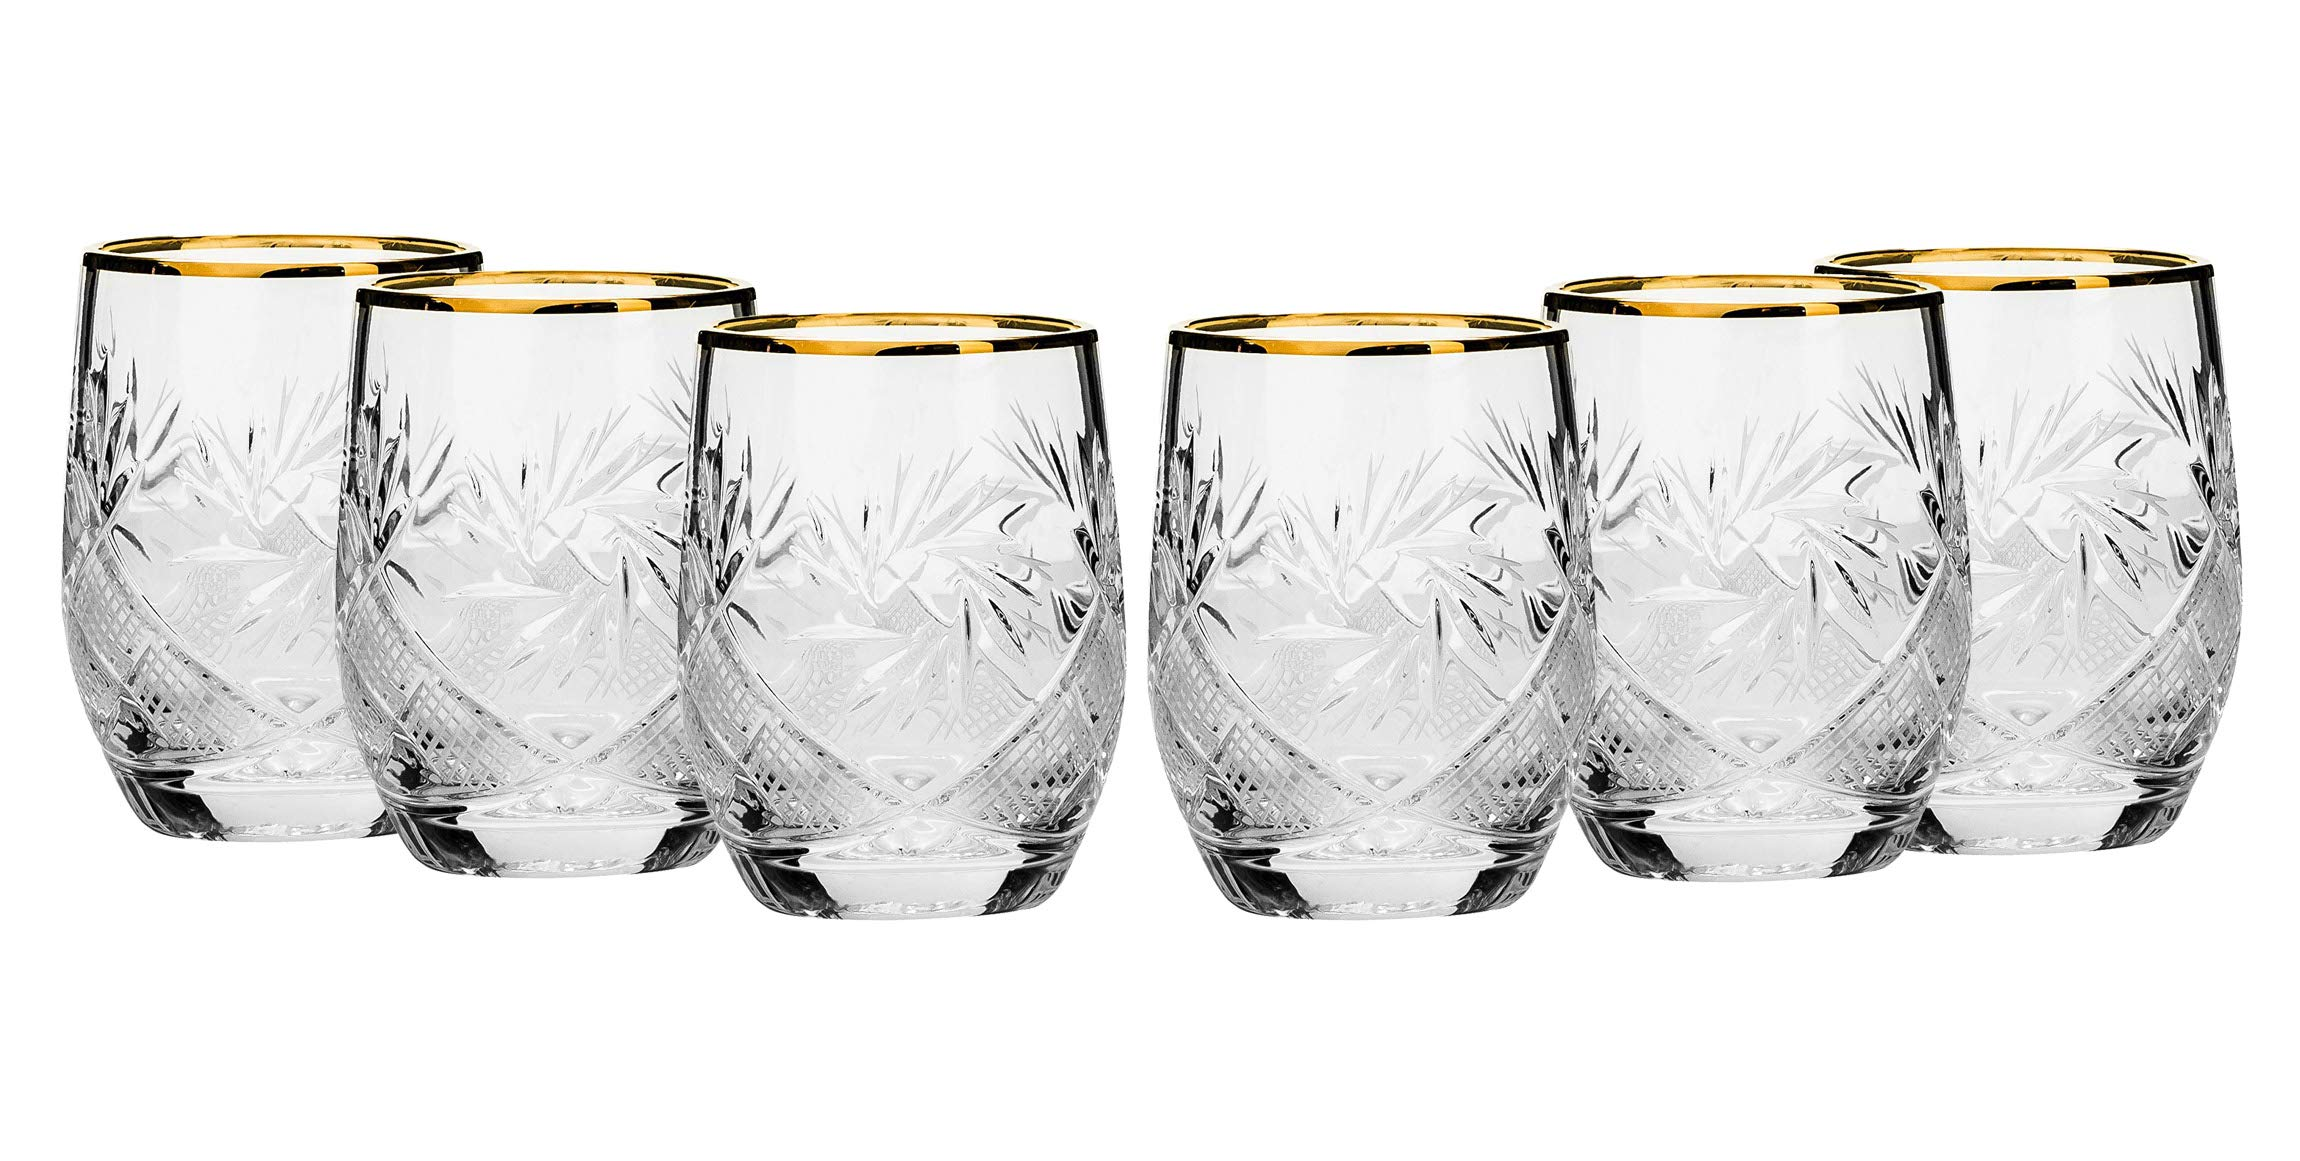 SET of 6 Russian Cut Crystal Shot Shooter Glasses 24K Gold Rimmed 1.7 Oz. Vodka Liquor Old-fashioned Glassware Hand Made by Neman Crystal